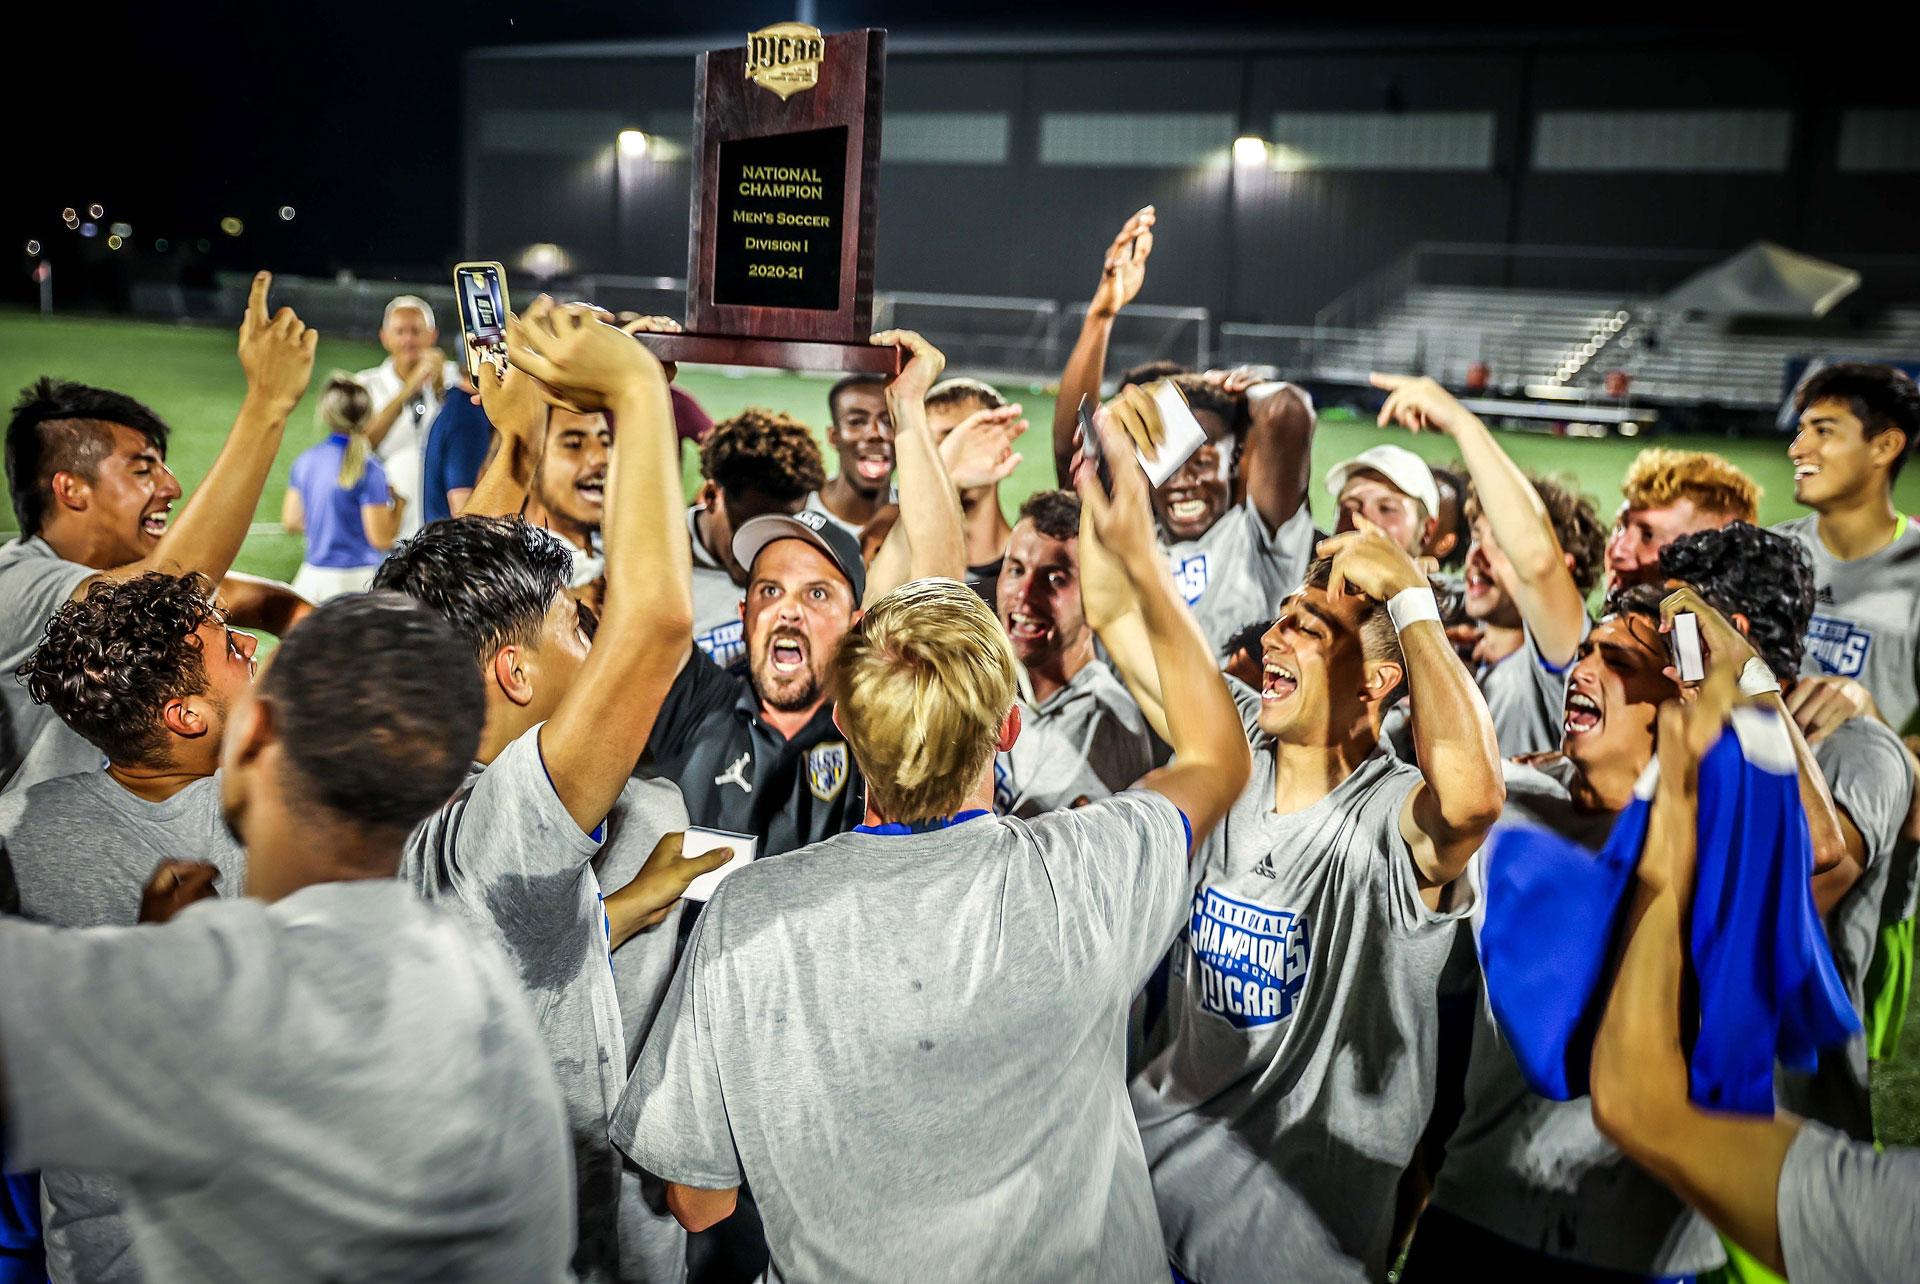 Coach Davis hoists trophy as players celebrate